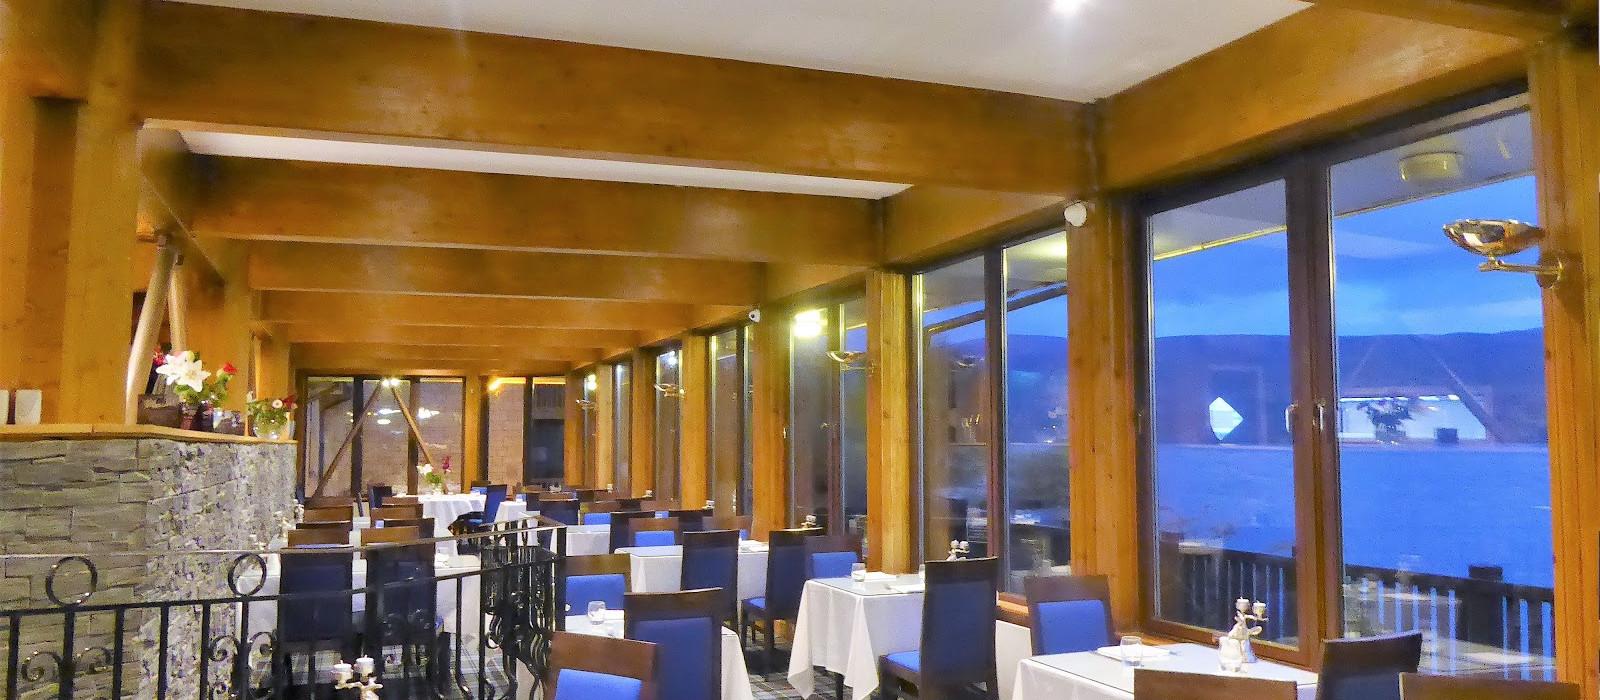 Hotel Lodge on Loch Lomond UK & Ireland